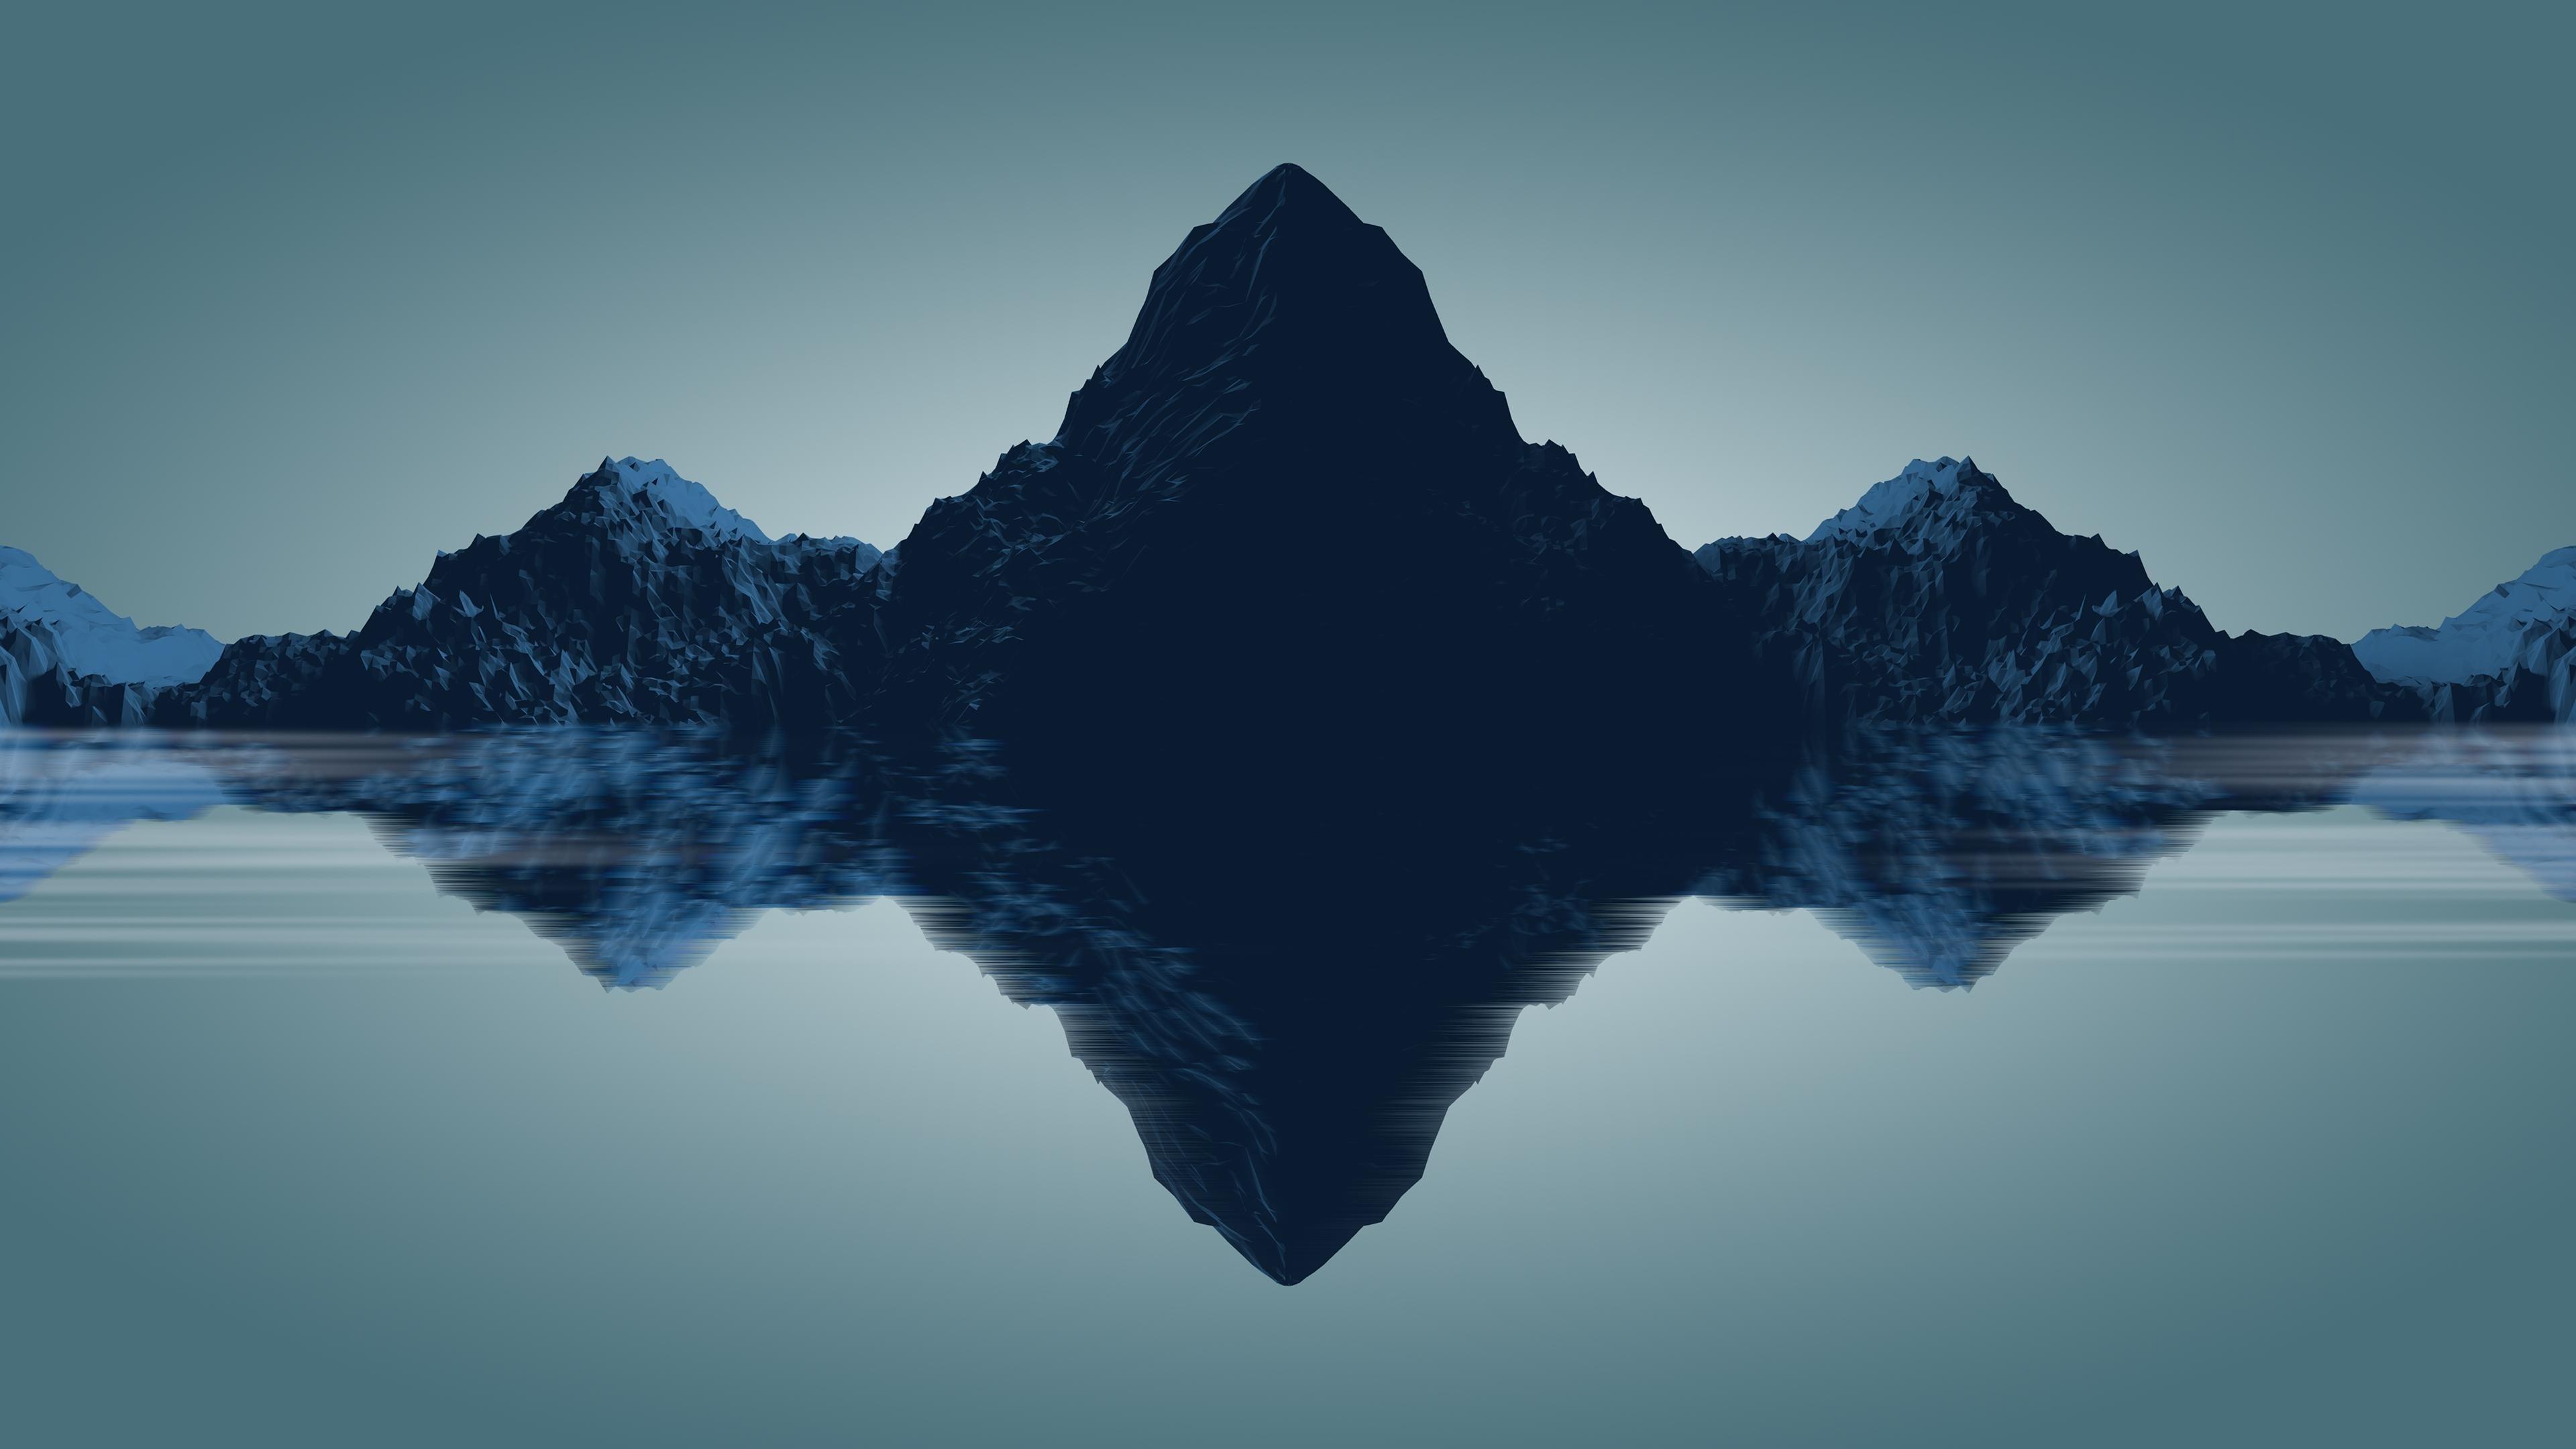 Res: 3840x2160, Title : minimal mountains, hd 4k wallpaper. Dimension : 3840 x 2160. File  Type : JPG/JPEG